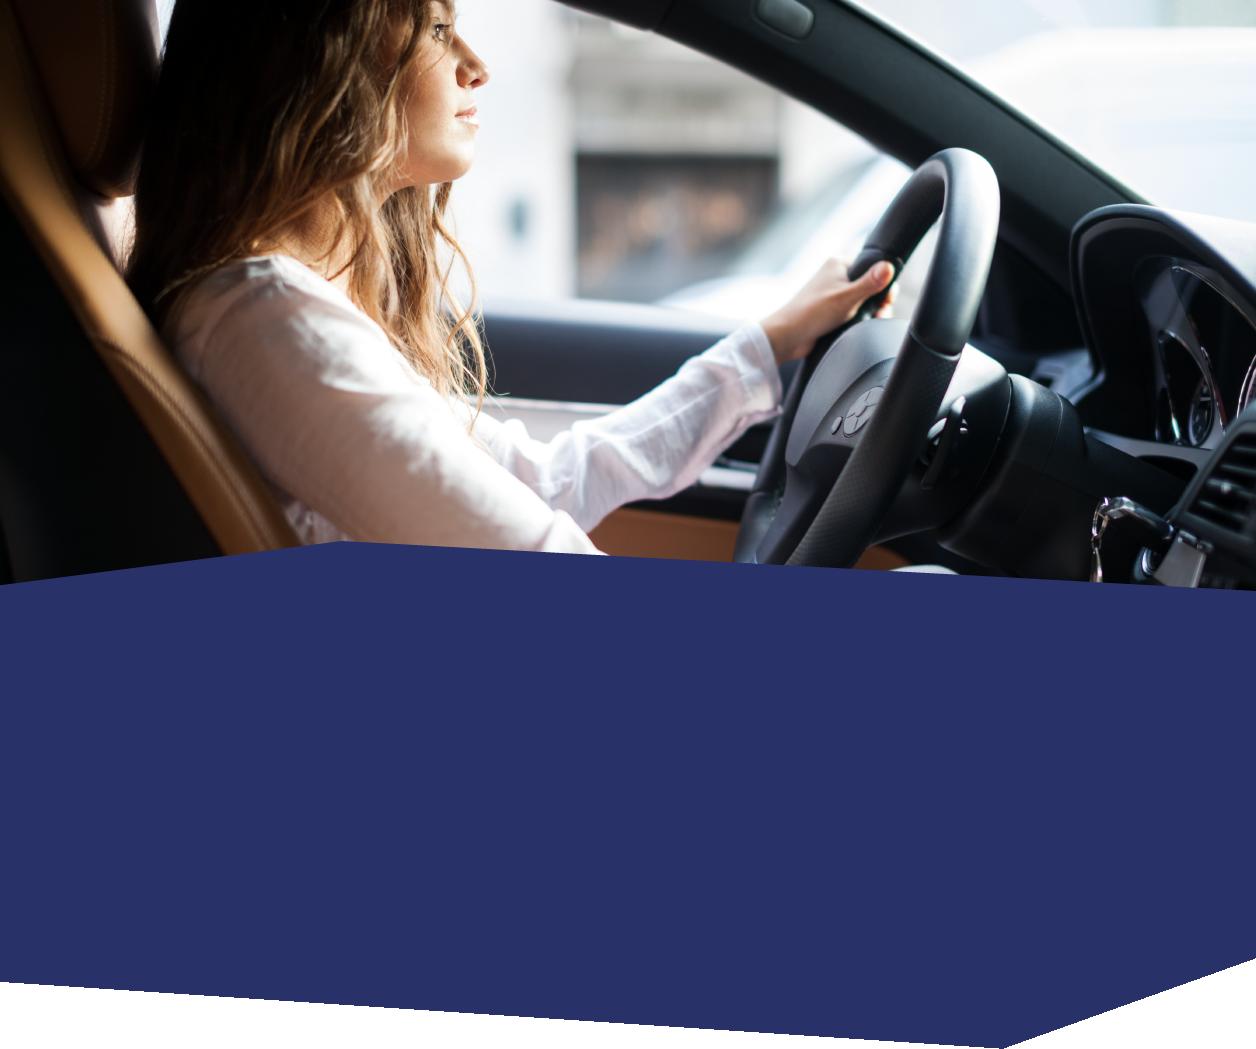 ch1 steering wheel - costs mileage reimbursement covers